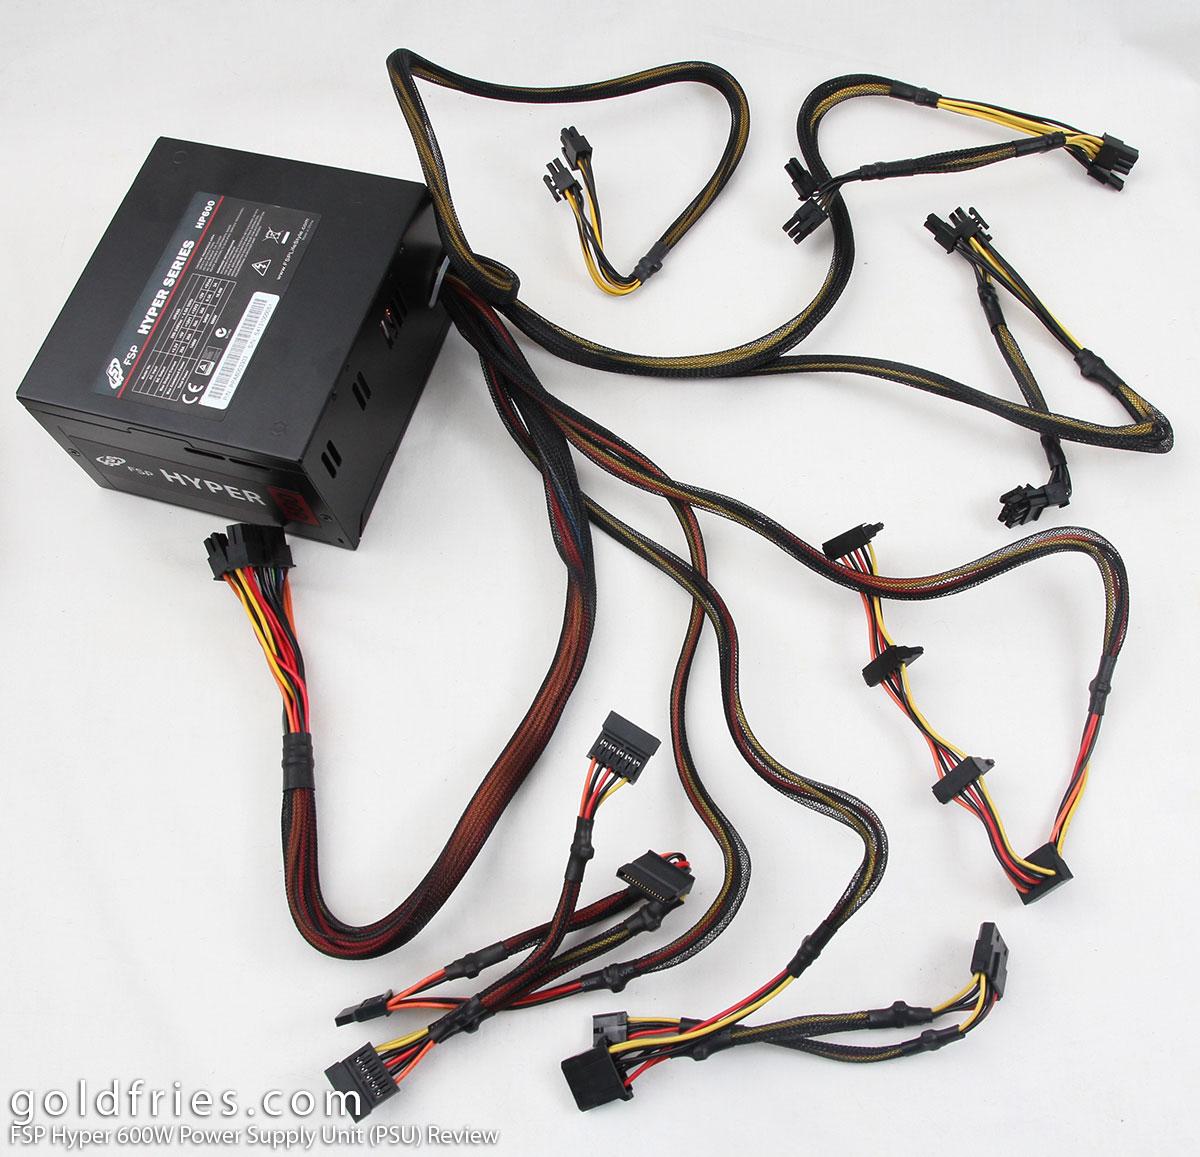 FSP Hyper 600W Power Supply Unit (PSU) Review